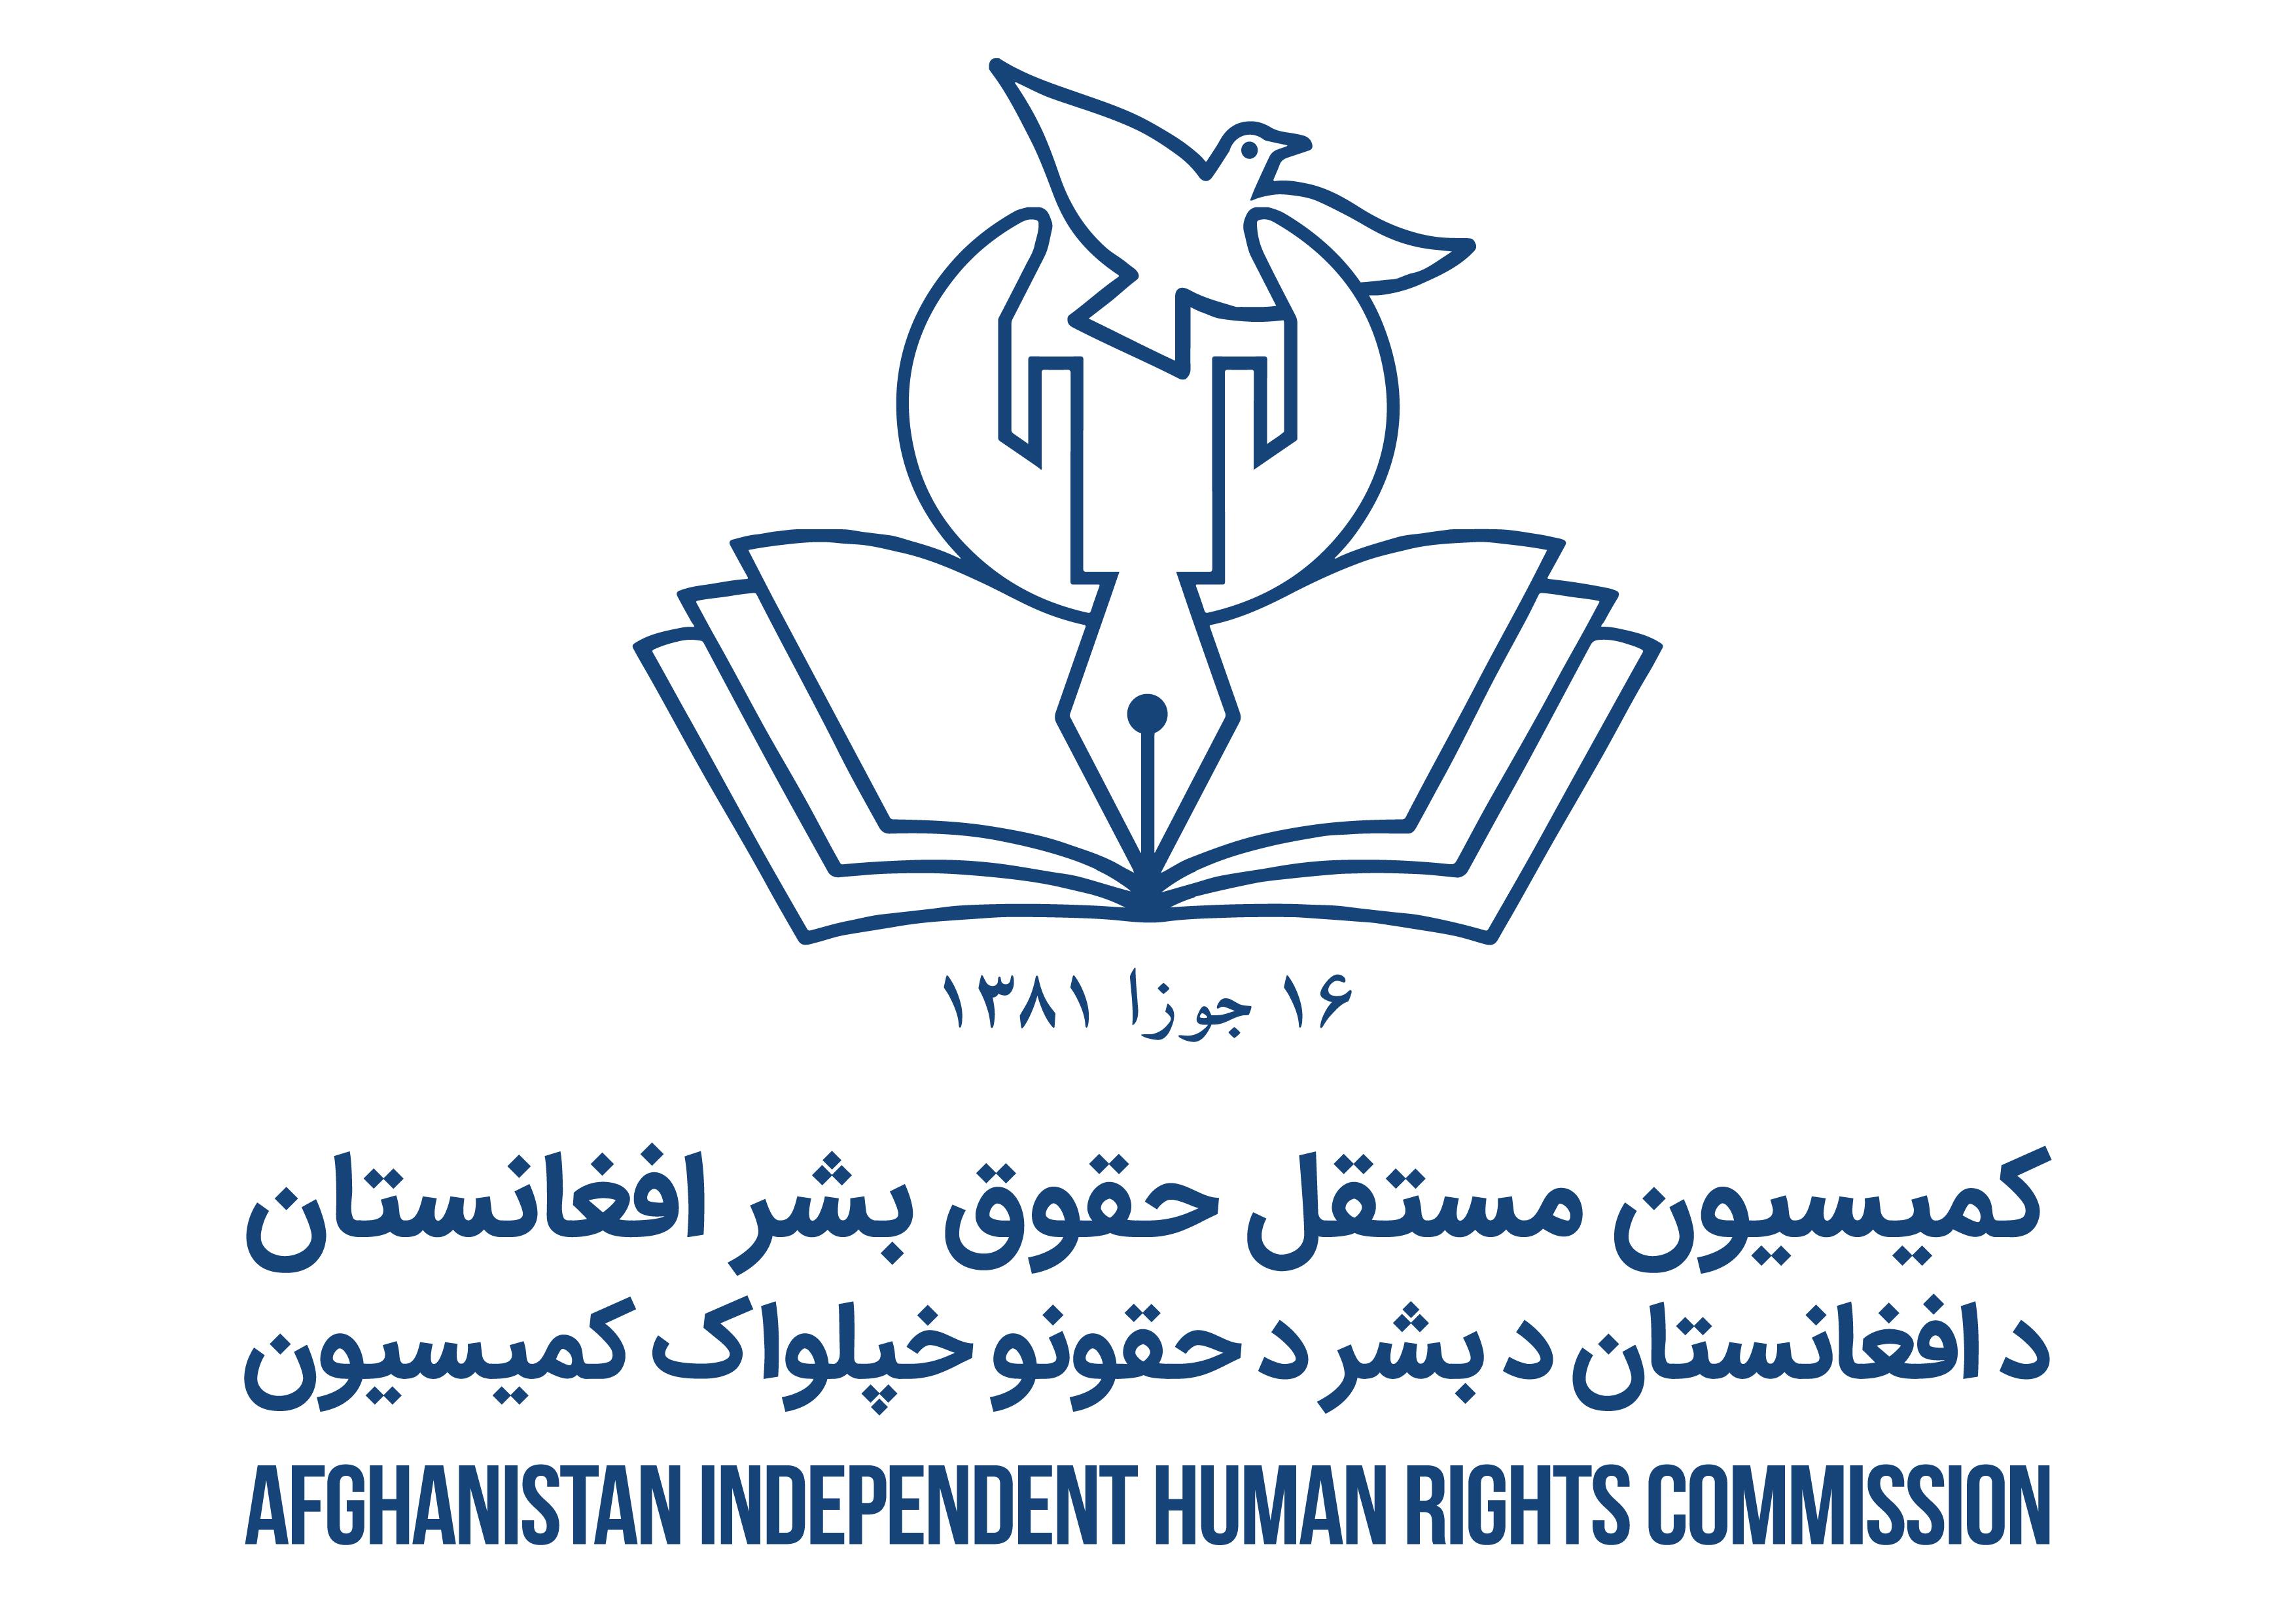 AIHRC Annual Report Final Cover گزارش سالانه کمیسیون مستقل حقوق بشر افغانستان